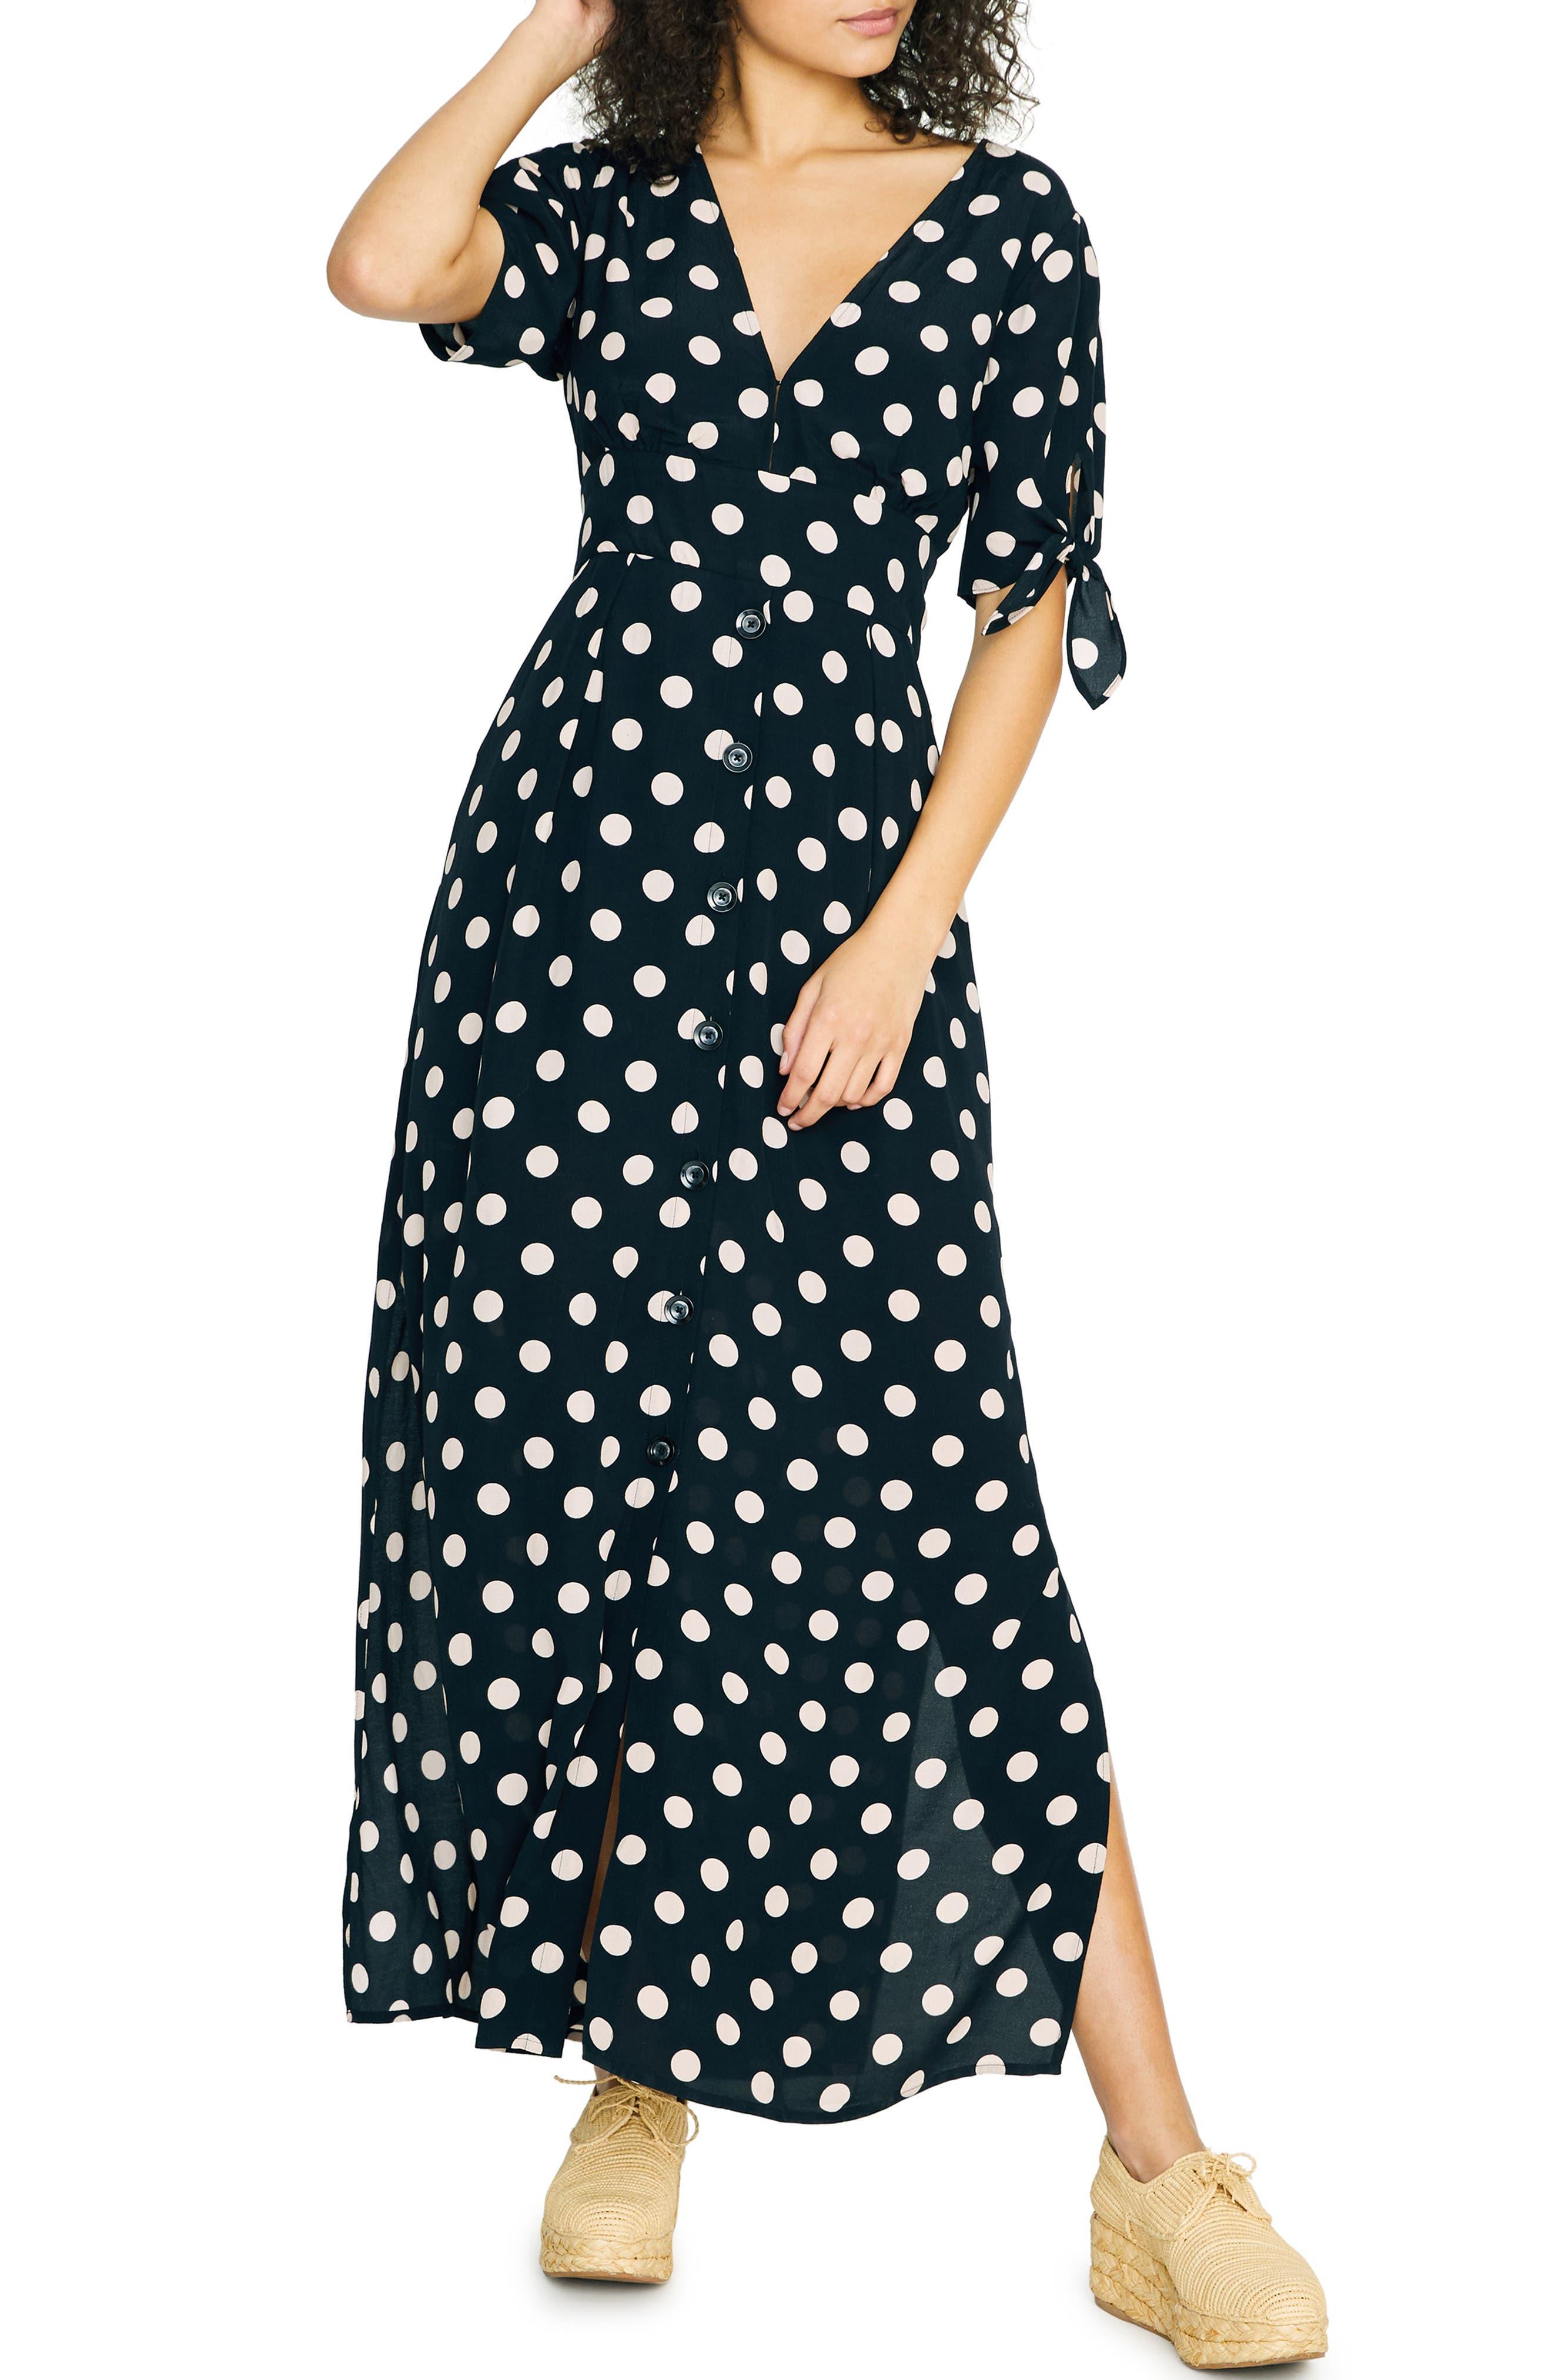 Sanctuary Love Worn Polka Dot Maxi Dress, Black